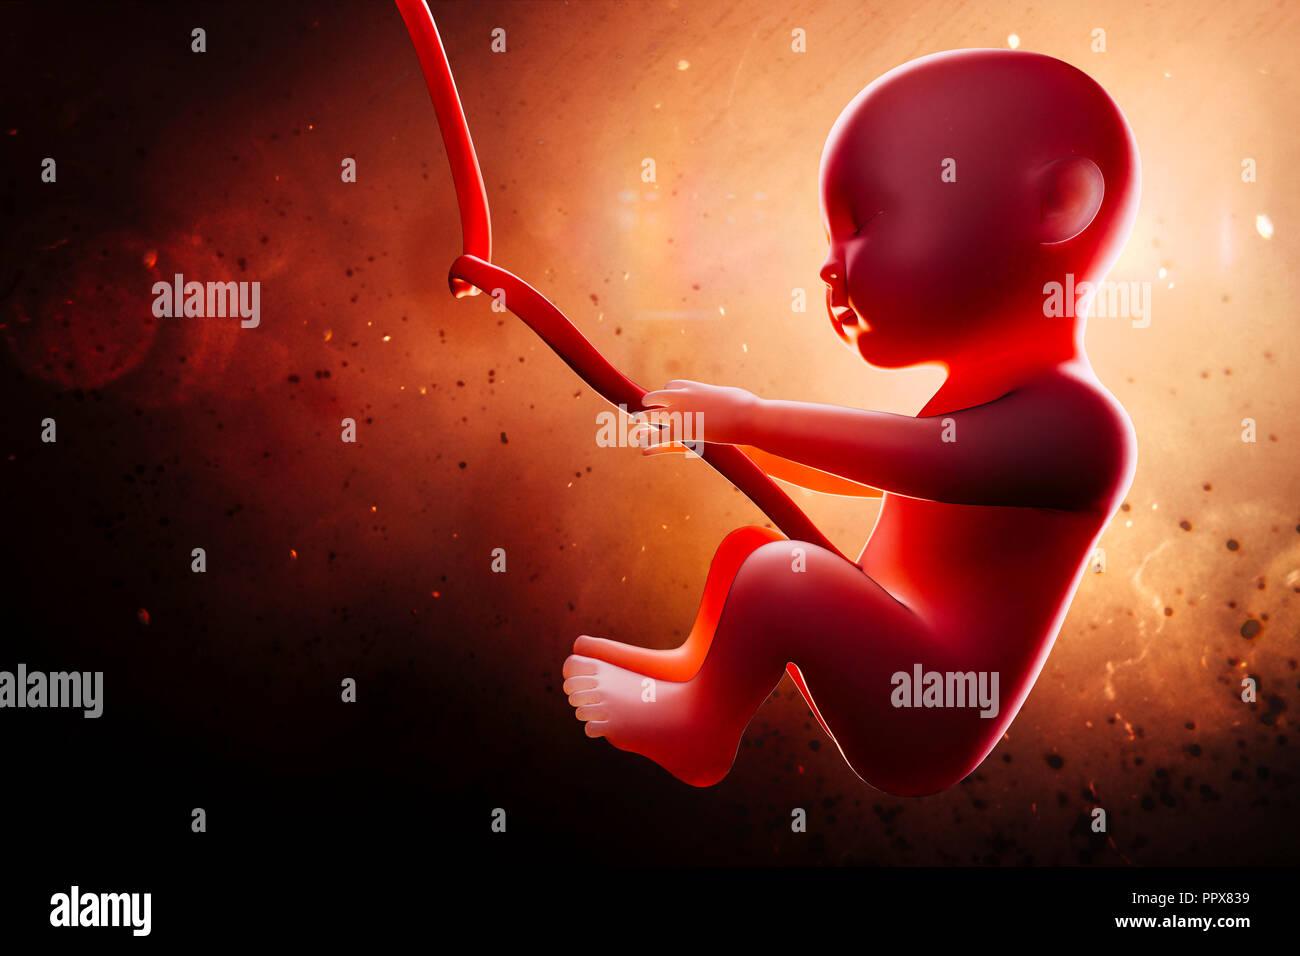 3d Human Fetus Inside The Womb Stock Photo 220623965 Alamy